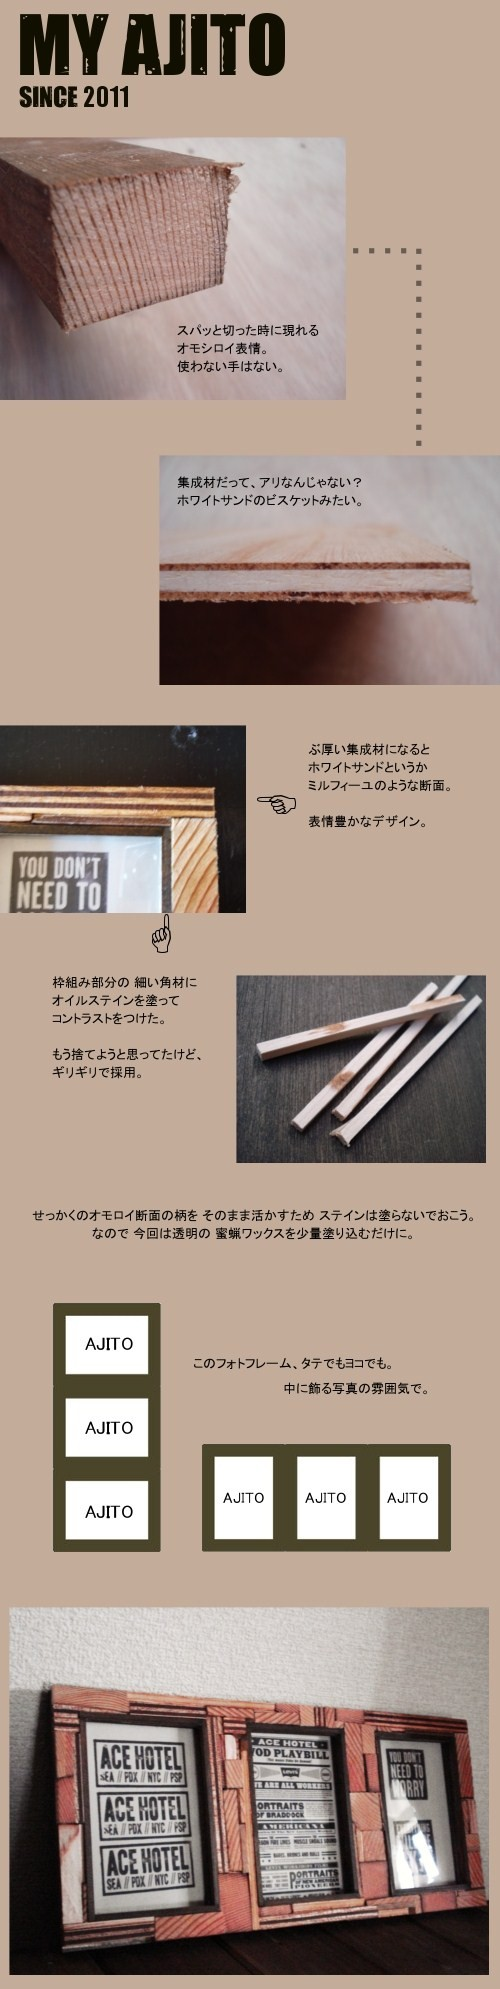 PHOTO3_3.jpg